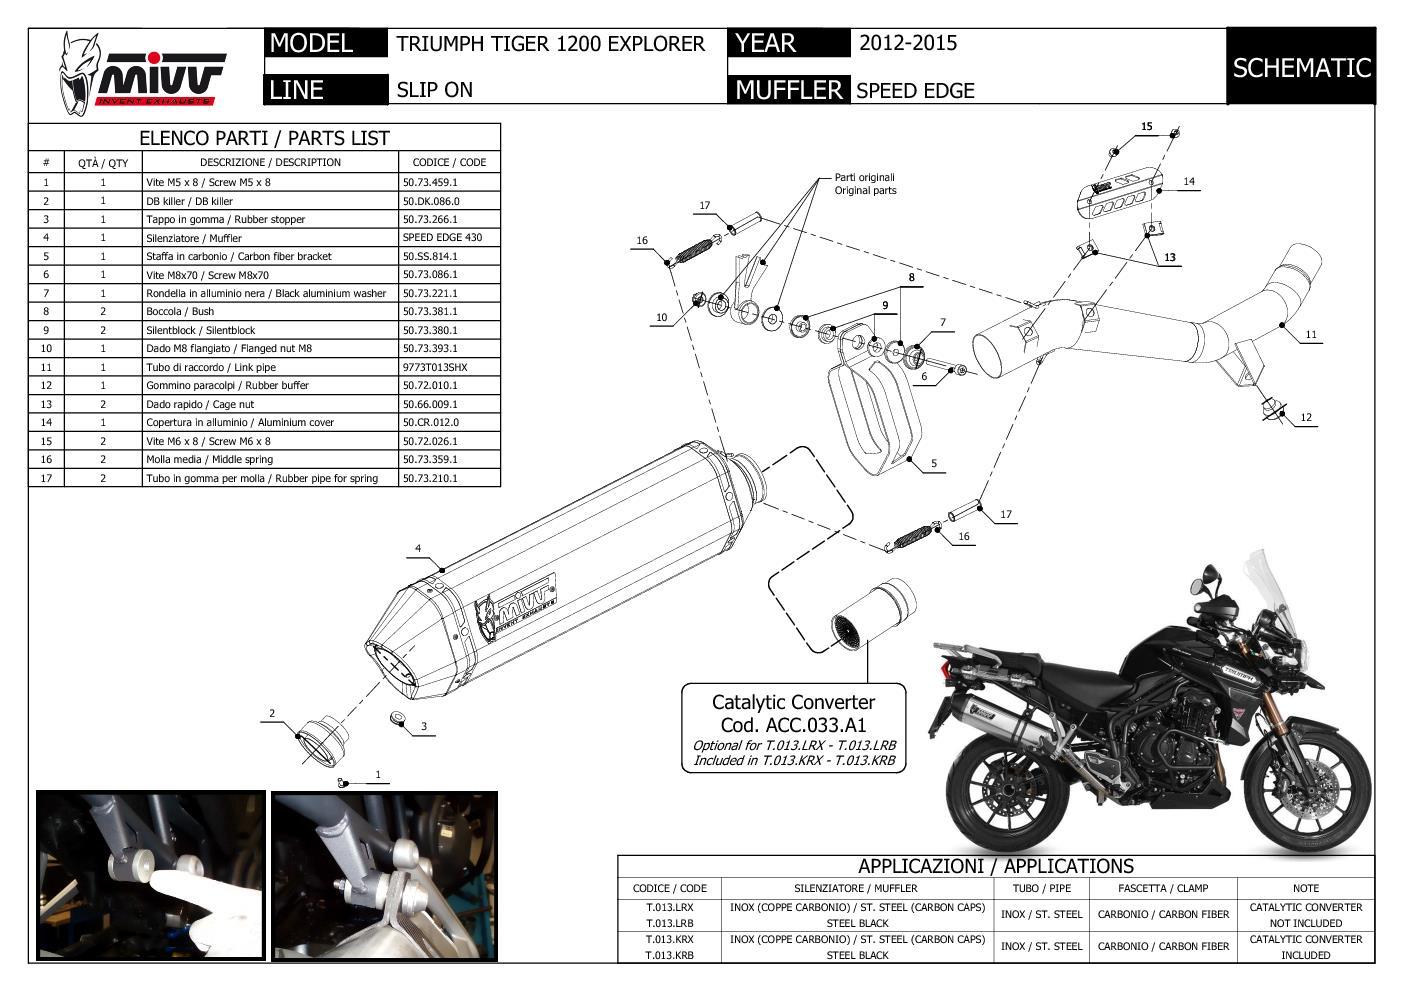 Mivv Exhaust Muffler Speed Edge Black Triumph Tiger